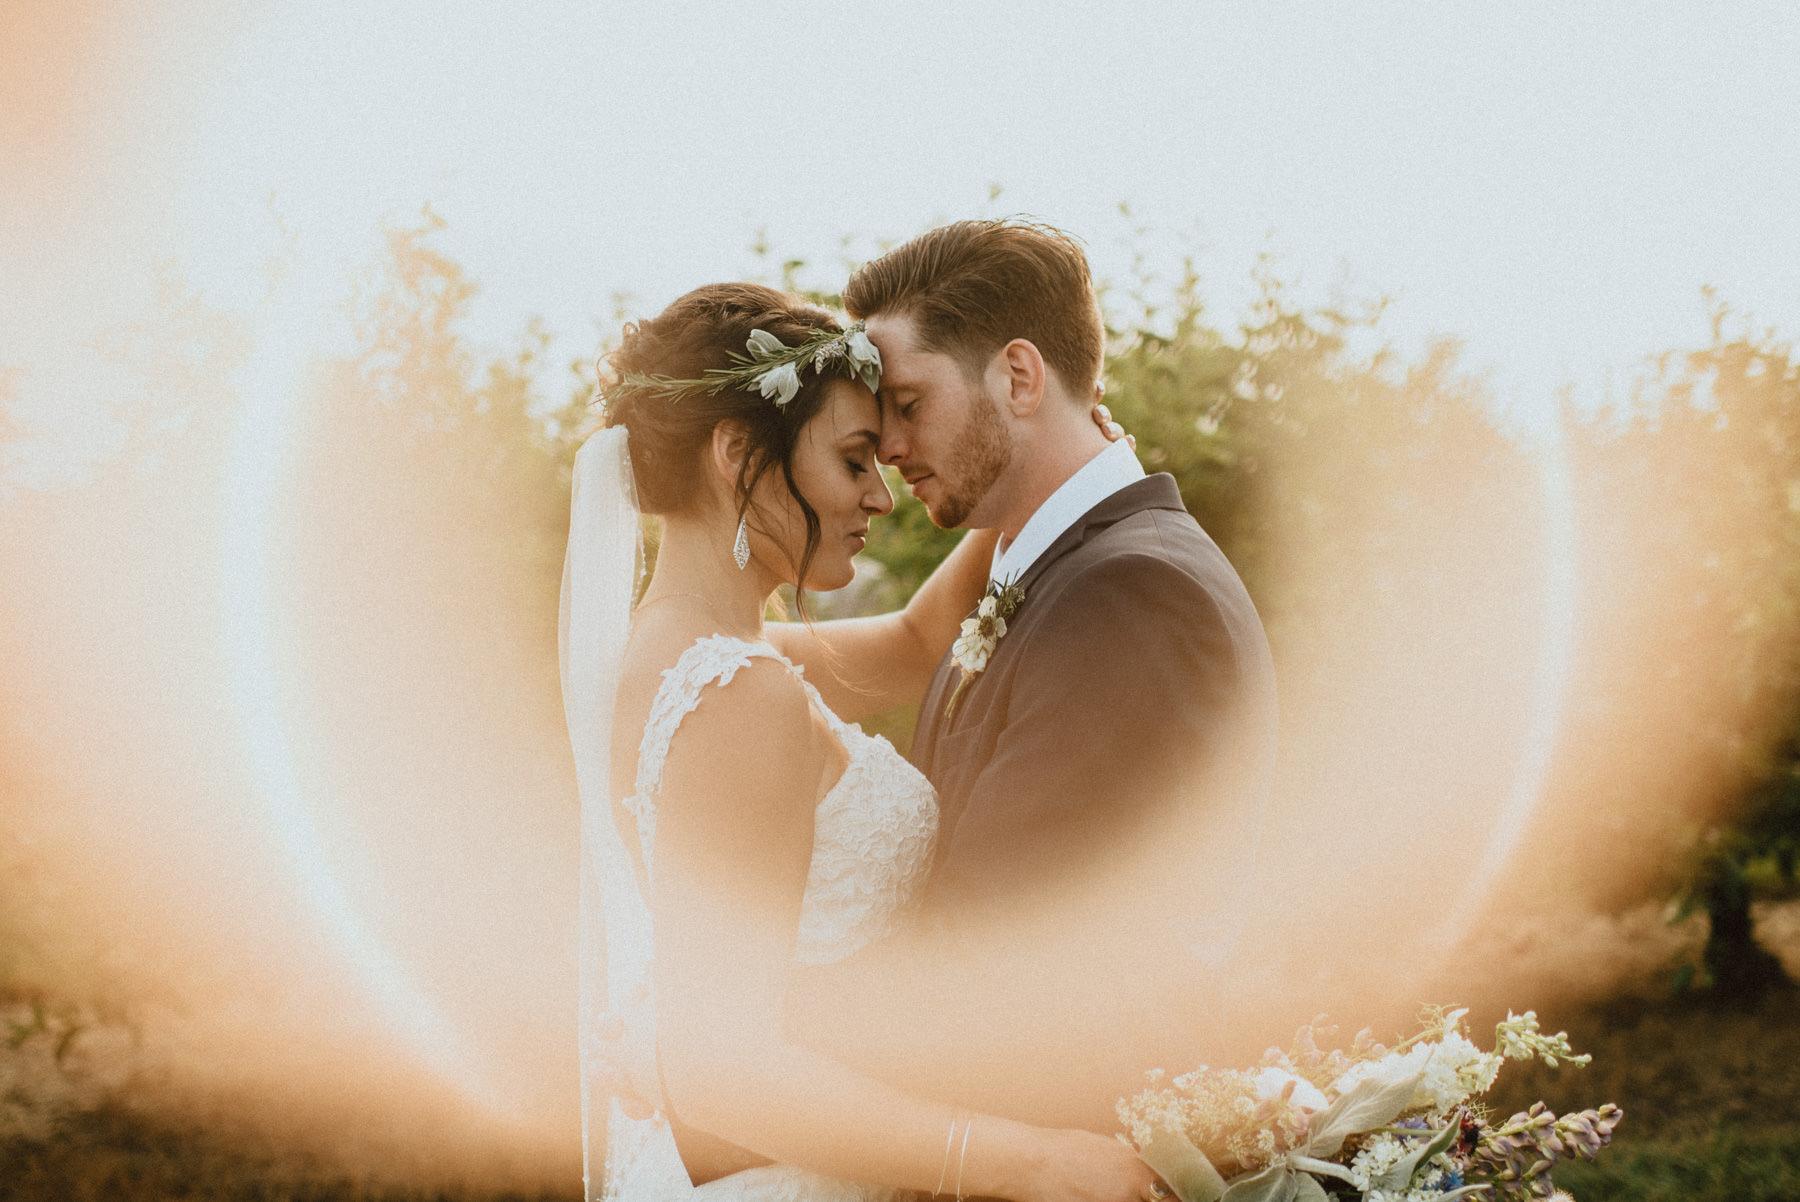 040-milburn-orchards-wedding-5.jpg